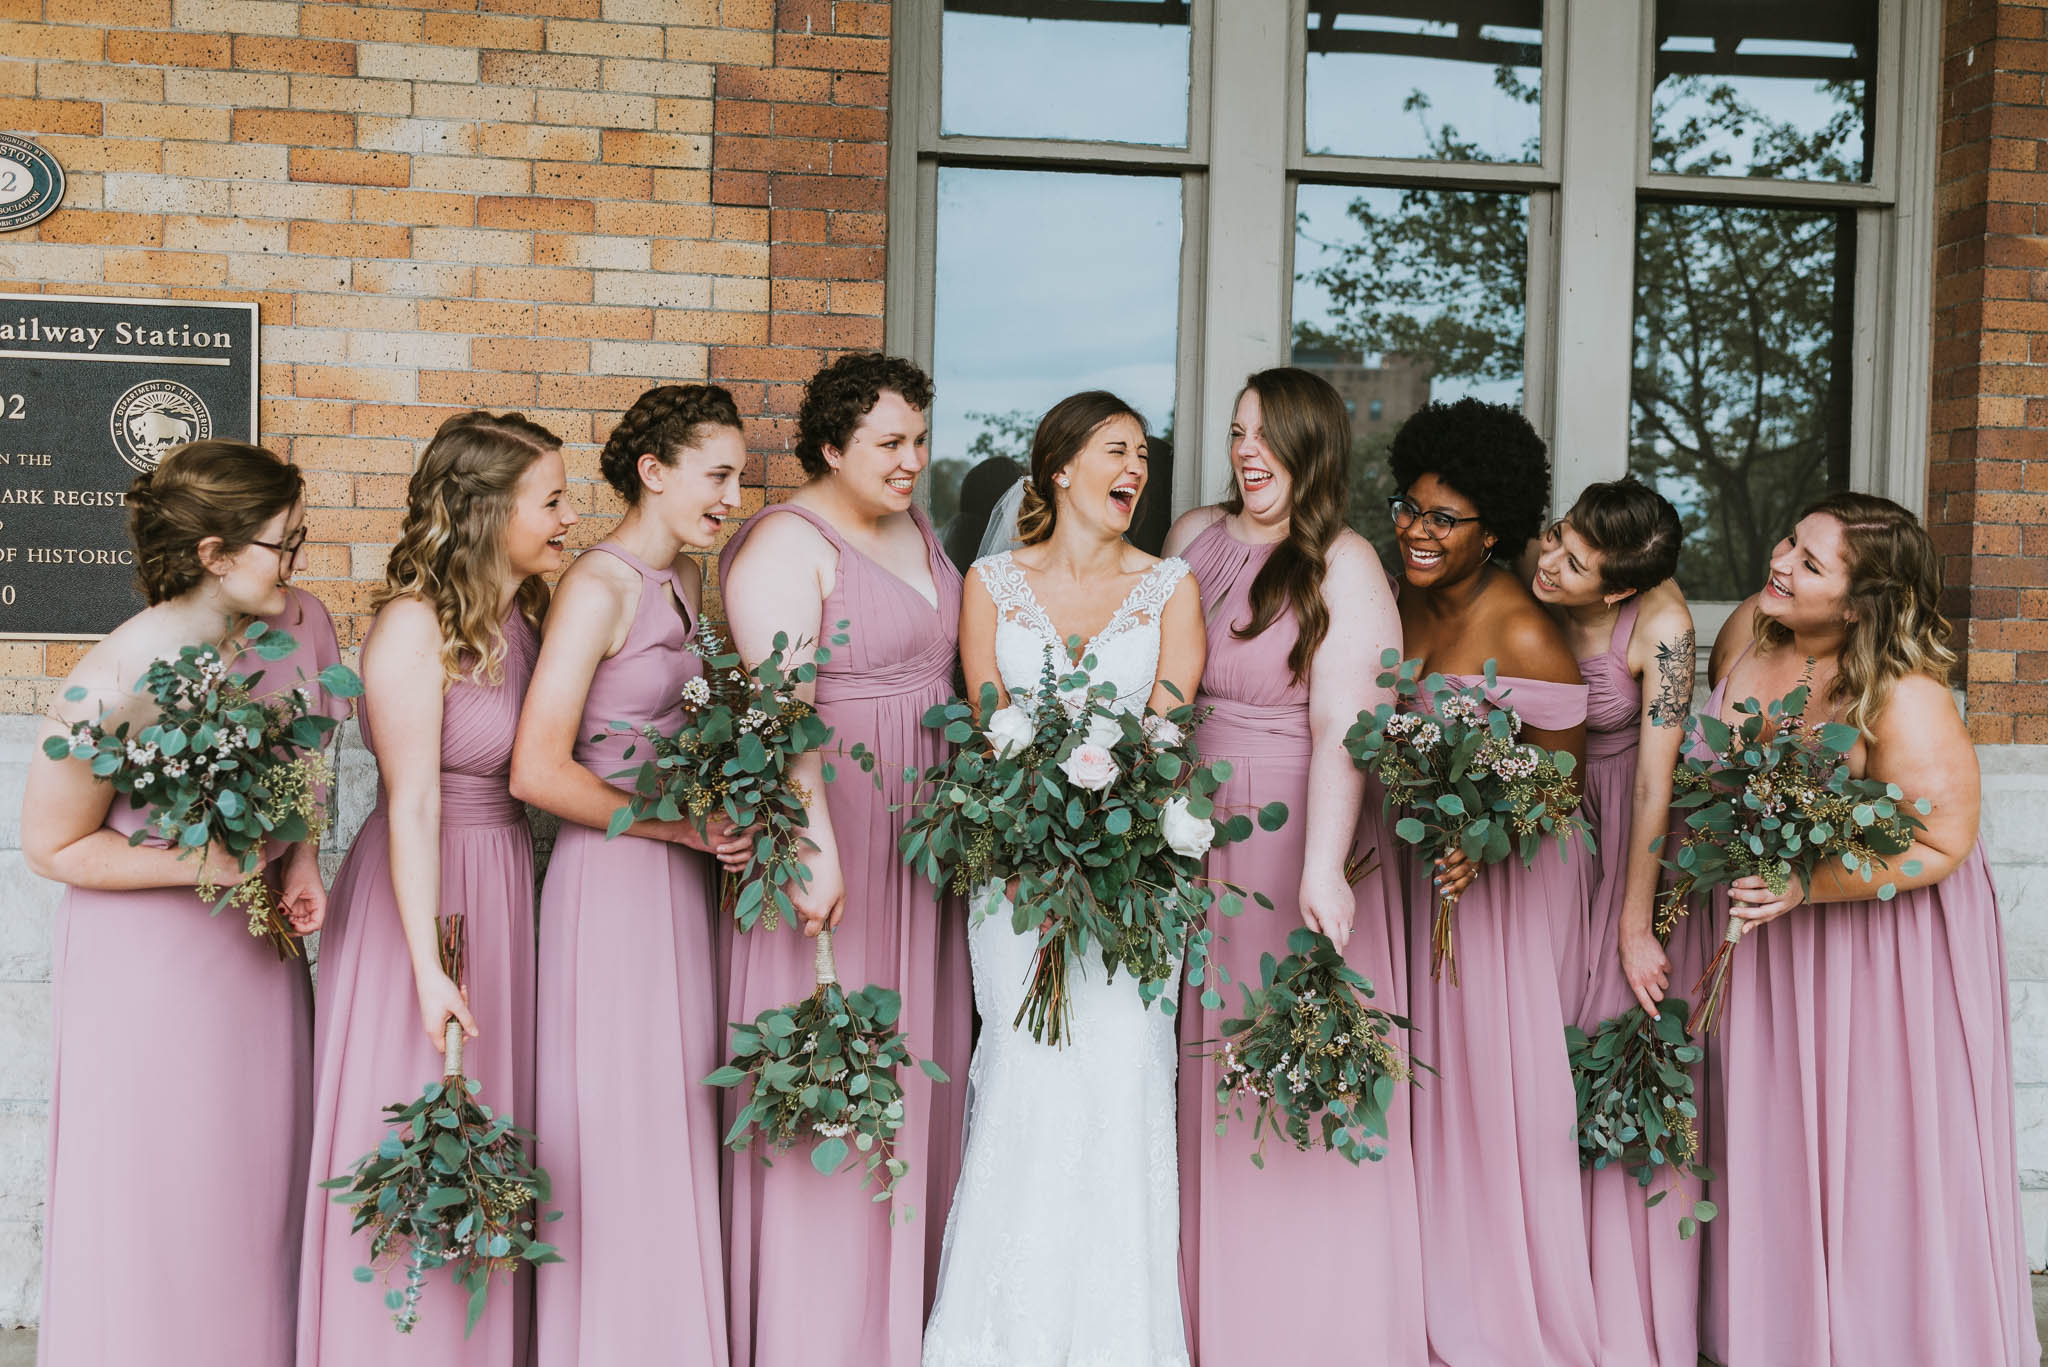 The Bristol Train Station Wedding, Bristol, TN, Northeast Tennessee Wedding Photographer, East Tennessee Wedding Photographer, Knoxville, TN Wedding Photographer